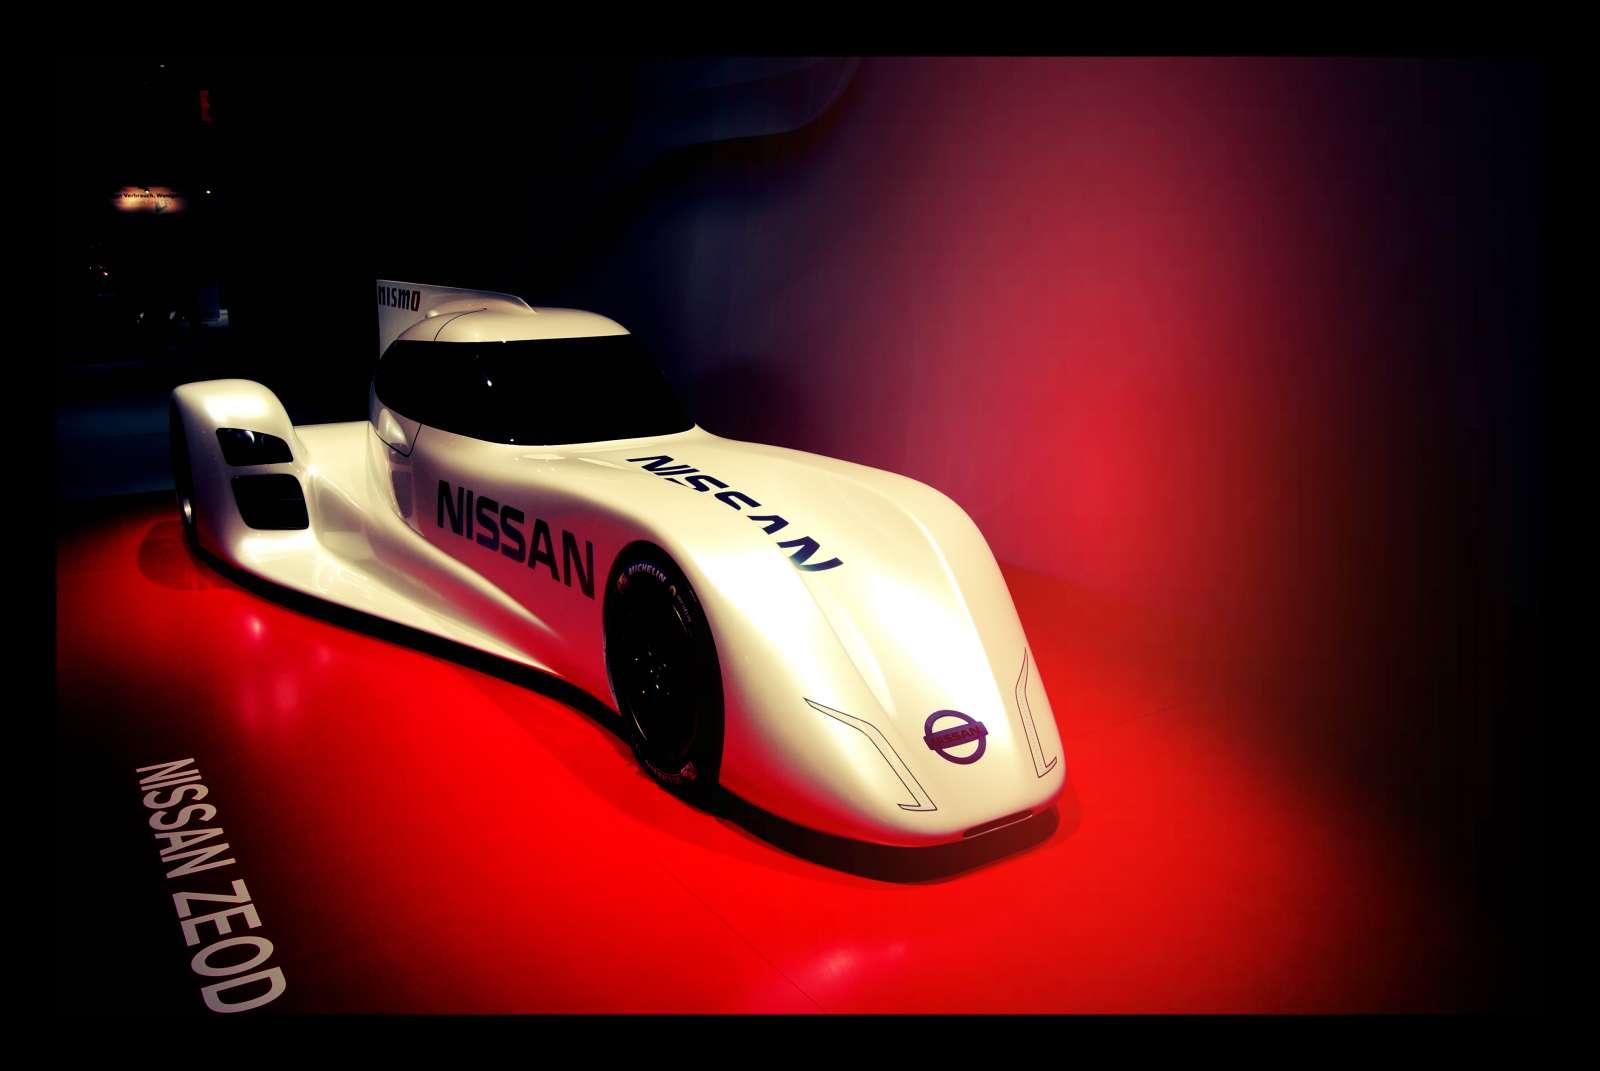 nissan_racing_marcin_wysocki